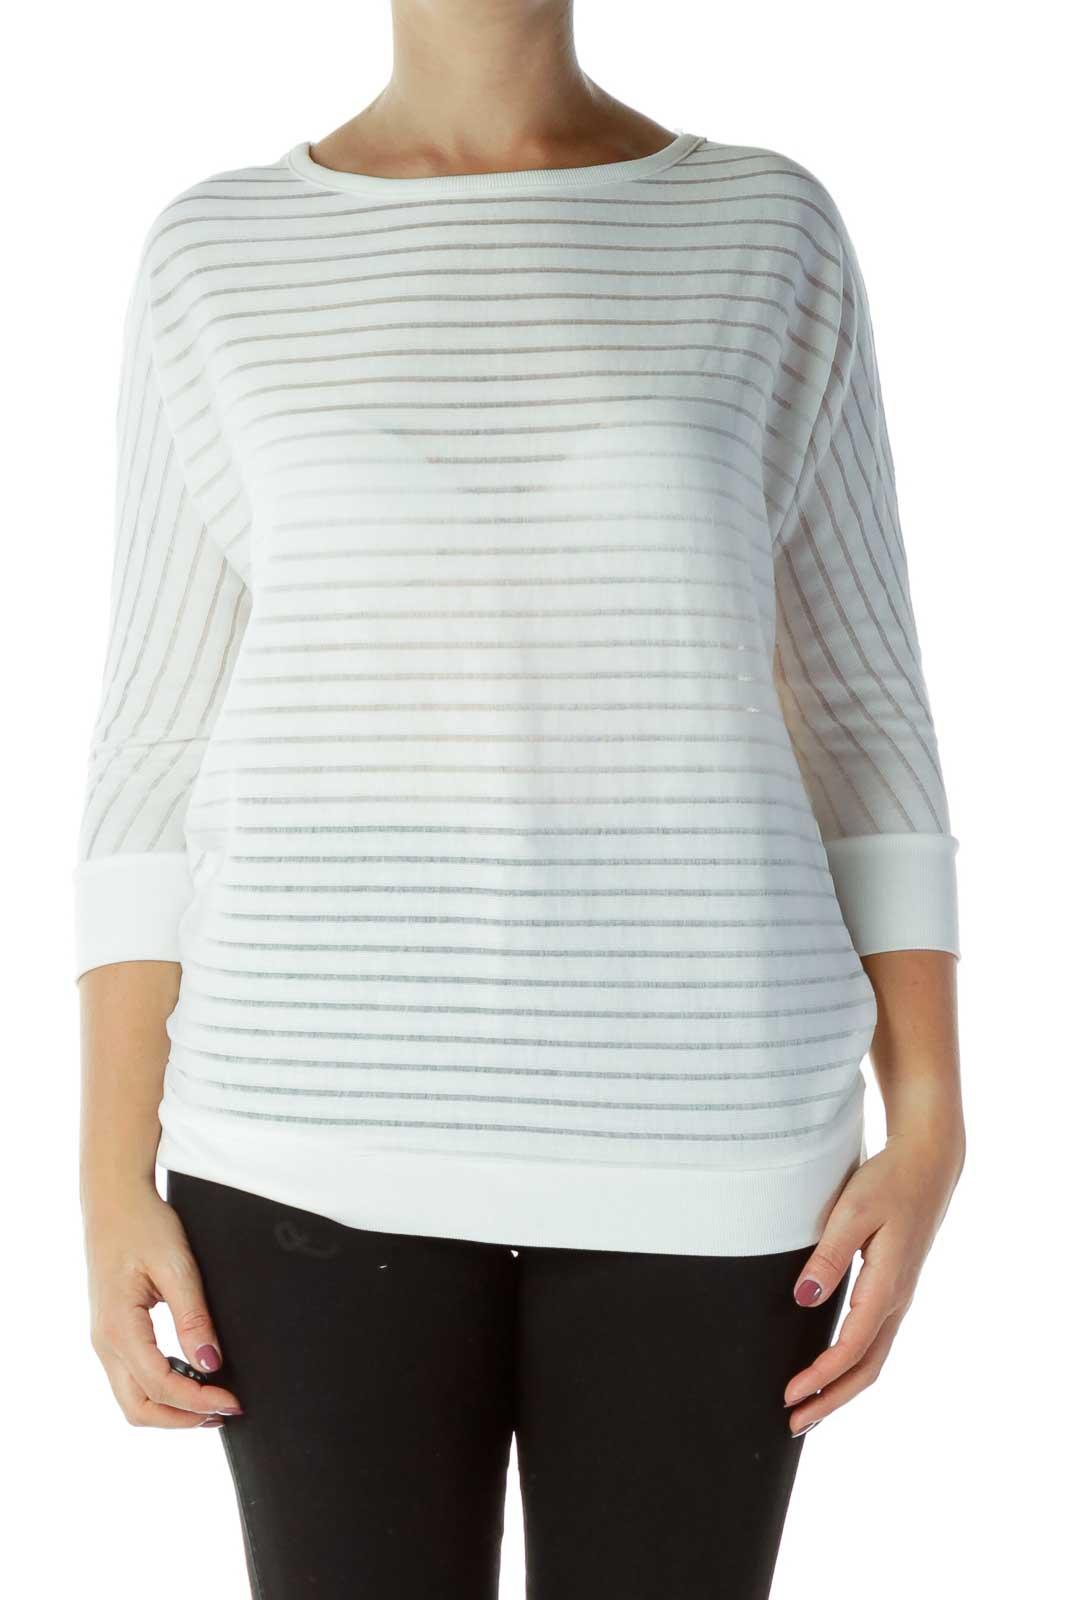 White Stripe Textured Top Front